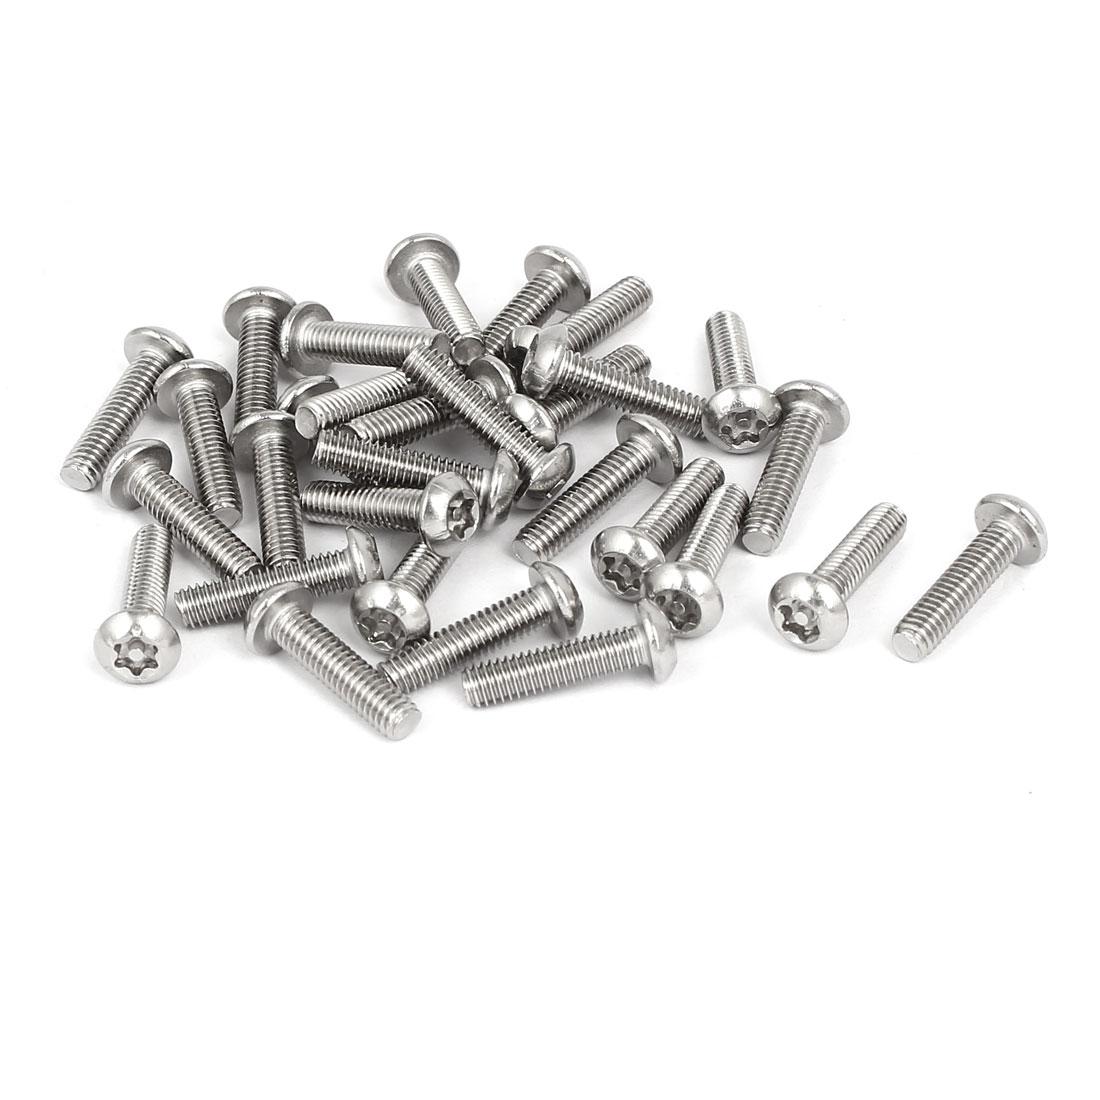 M4x16mm 304 Stainless Steel Button Head Torx Tamper Resistant Screws 30pcs